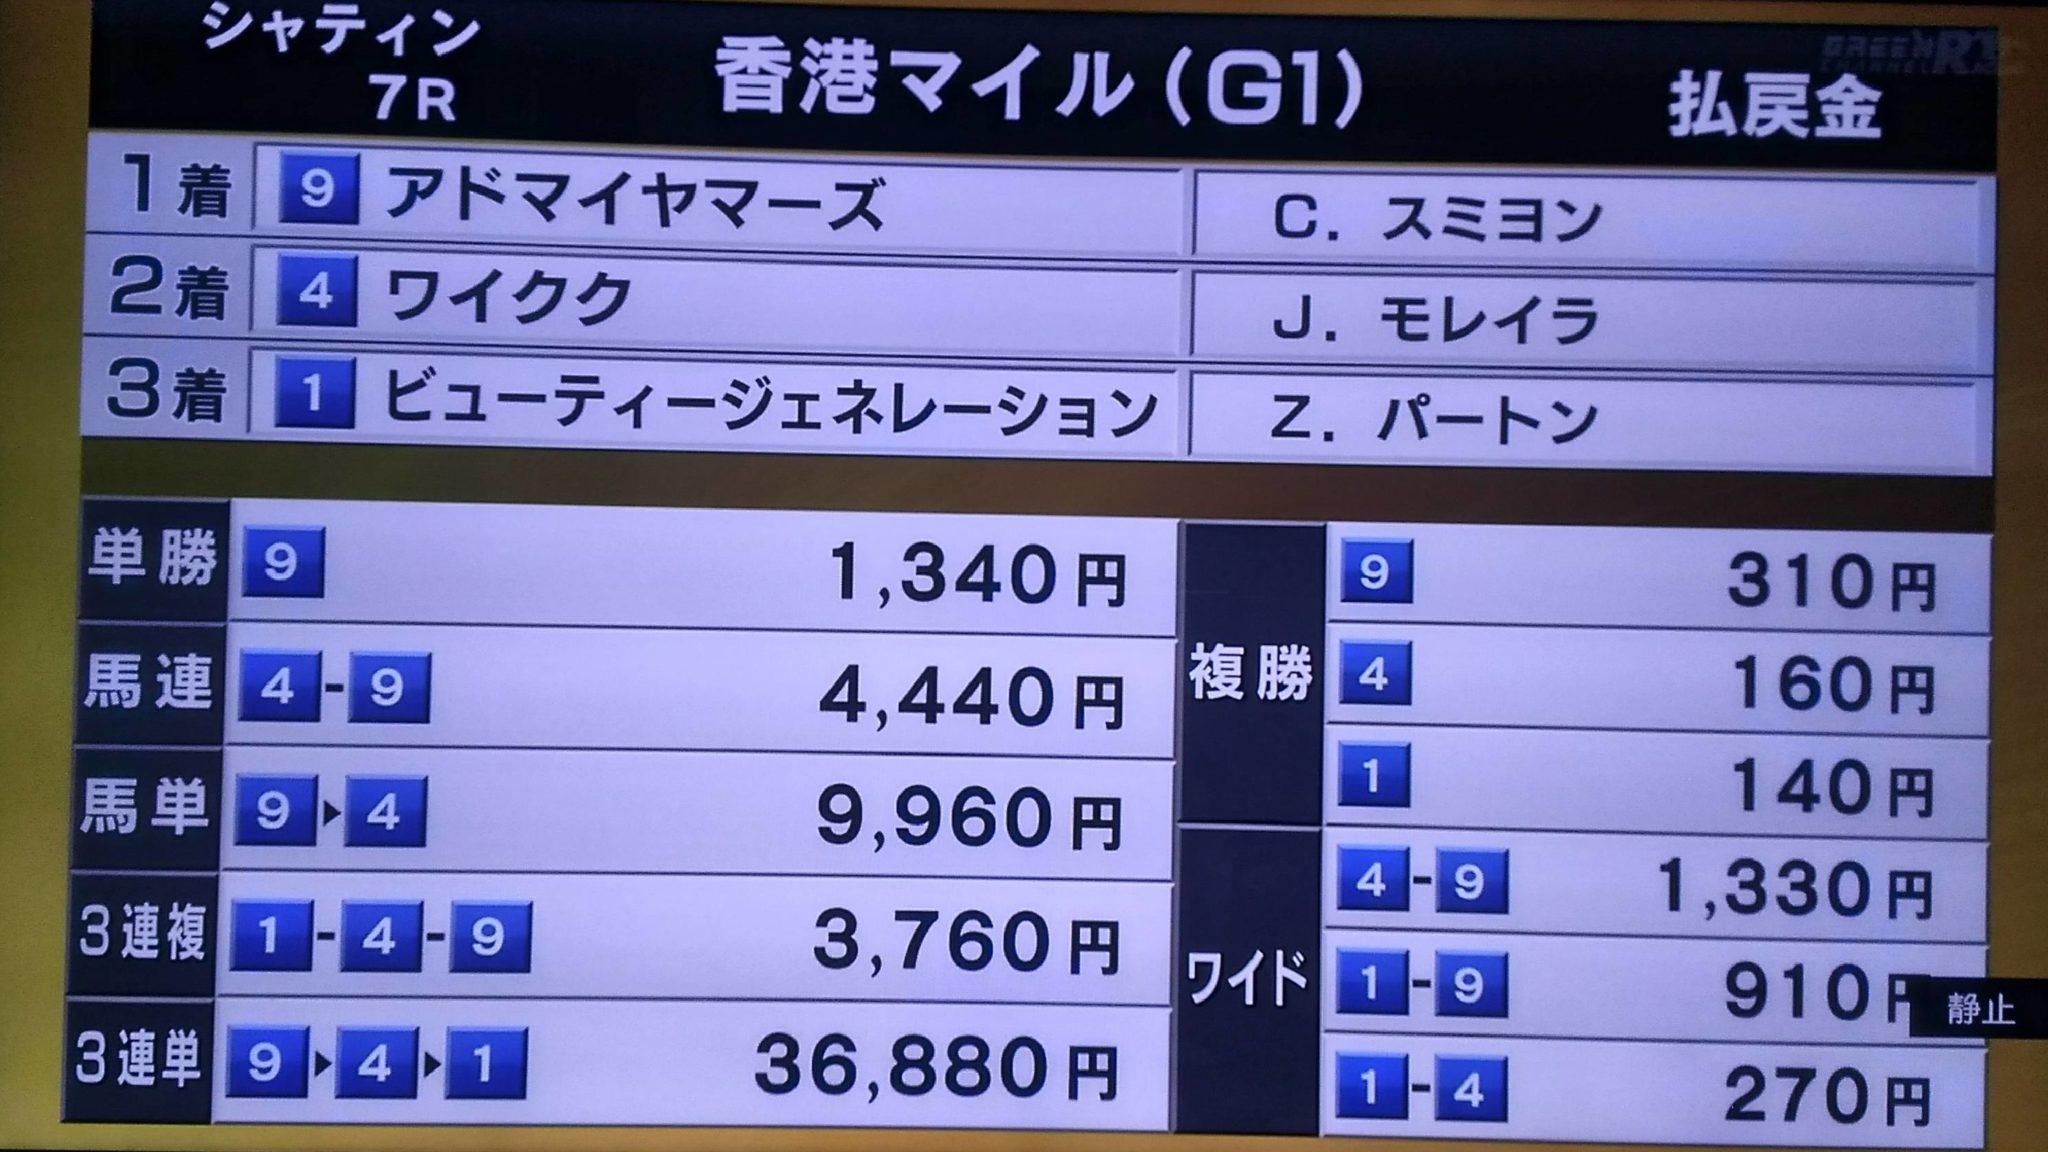 mnewsplus 1575791318 1601 scaled - 香港マイル(シャティン・香港G1) 日本の3歳マイル王が戴冠!中団追走アドマイヤマーズ(スミヨン)ゴール前で抜け出しG1・3勝目!